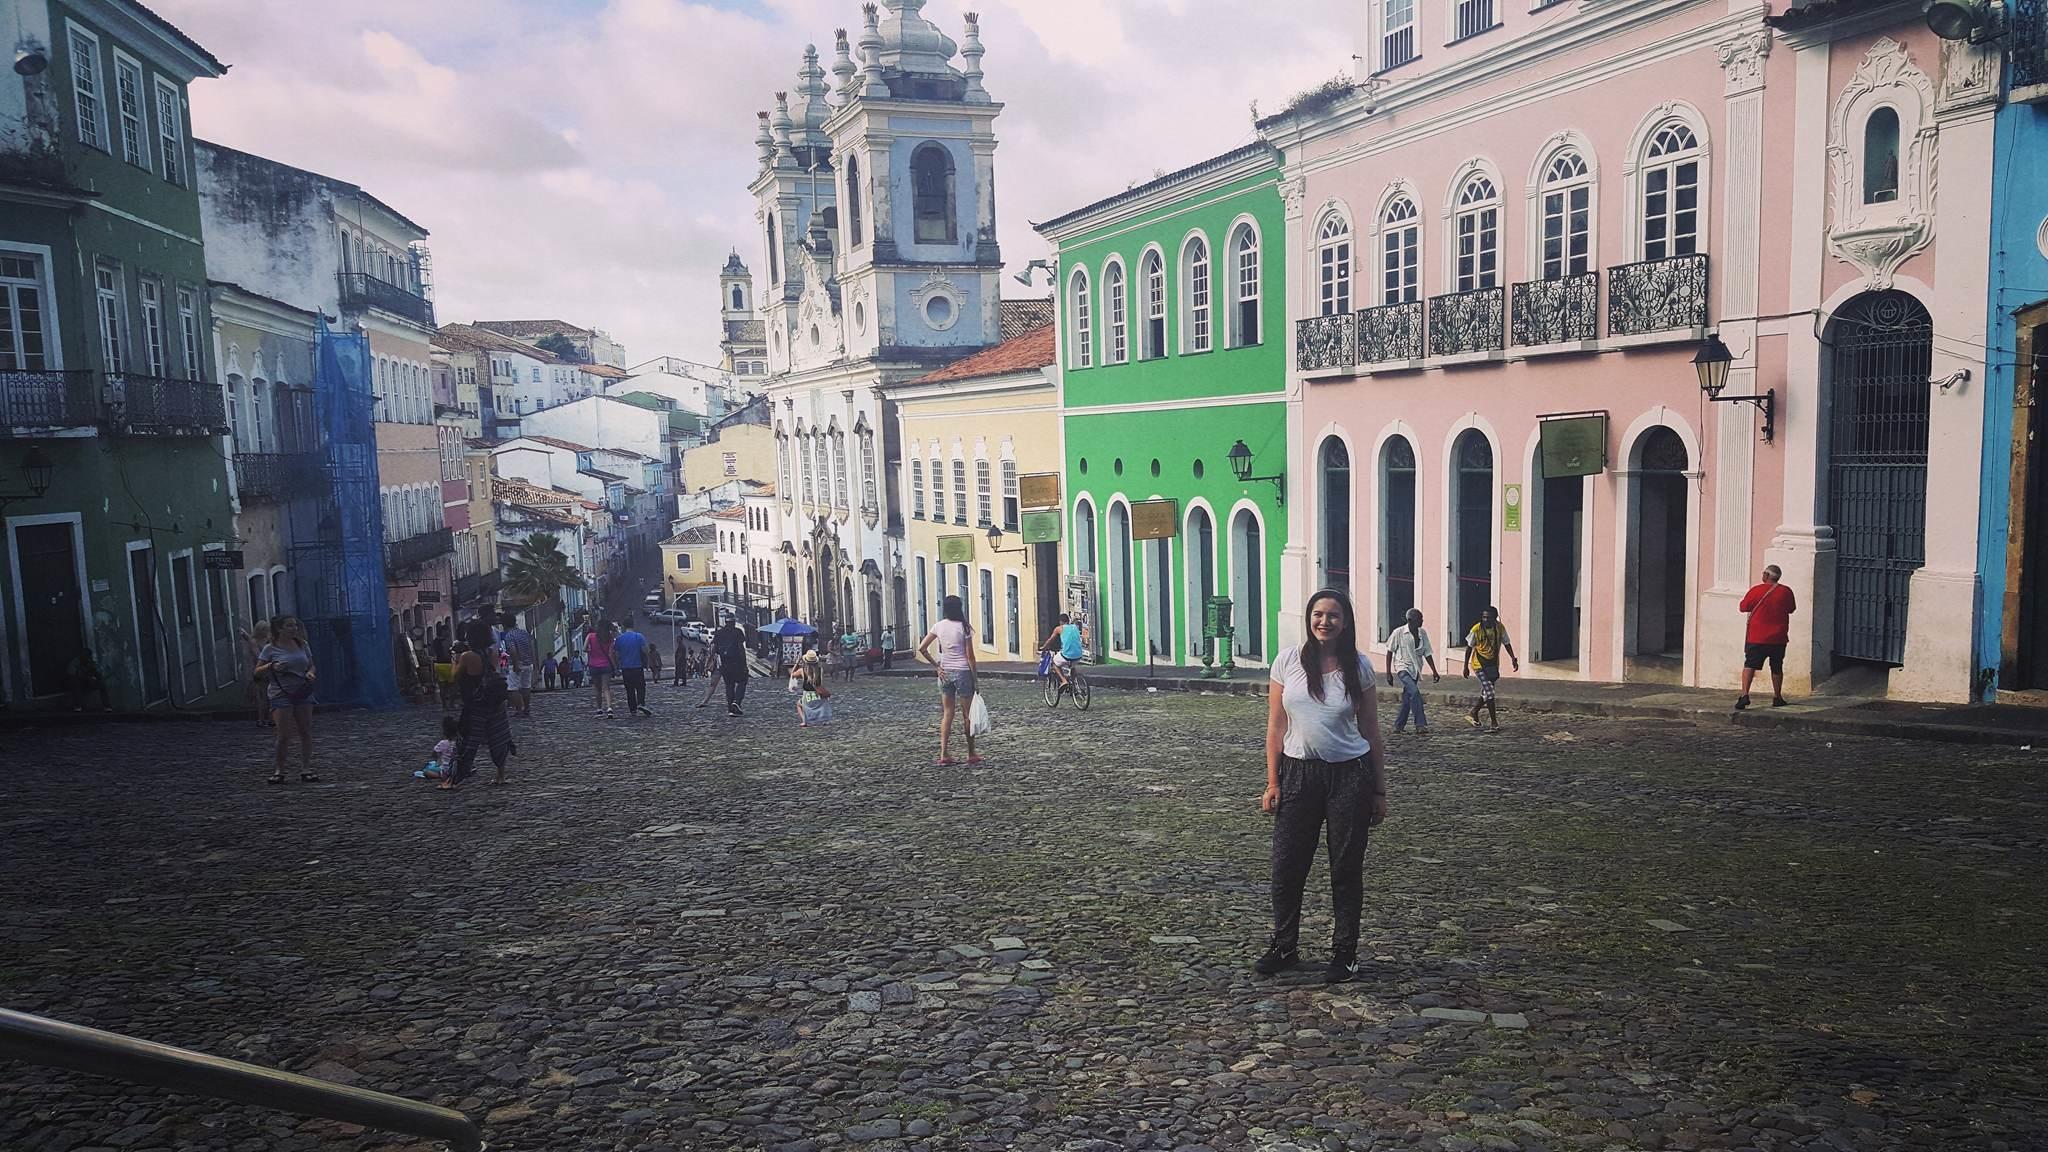 Salvador historic centre